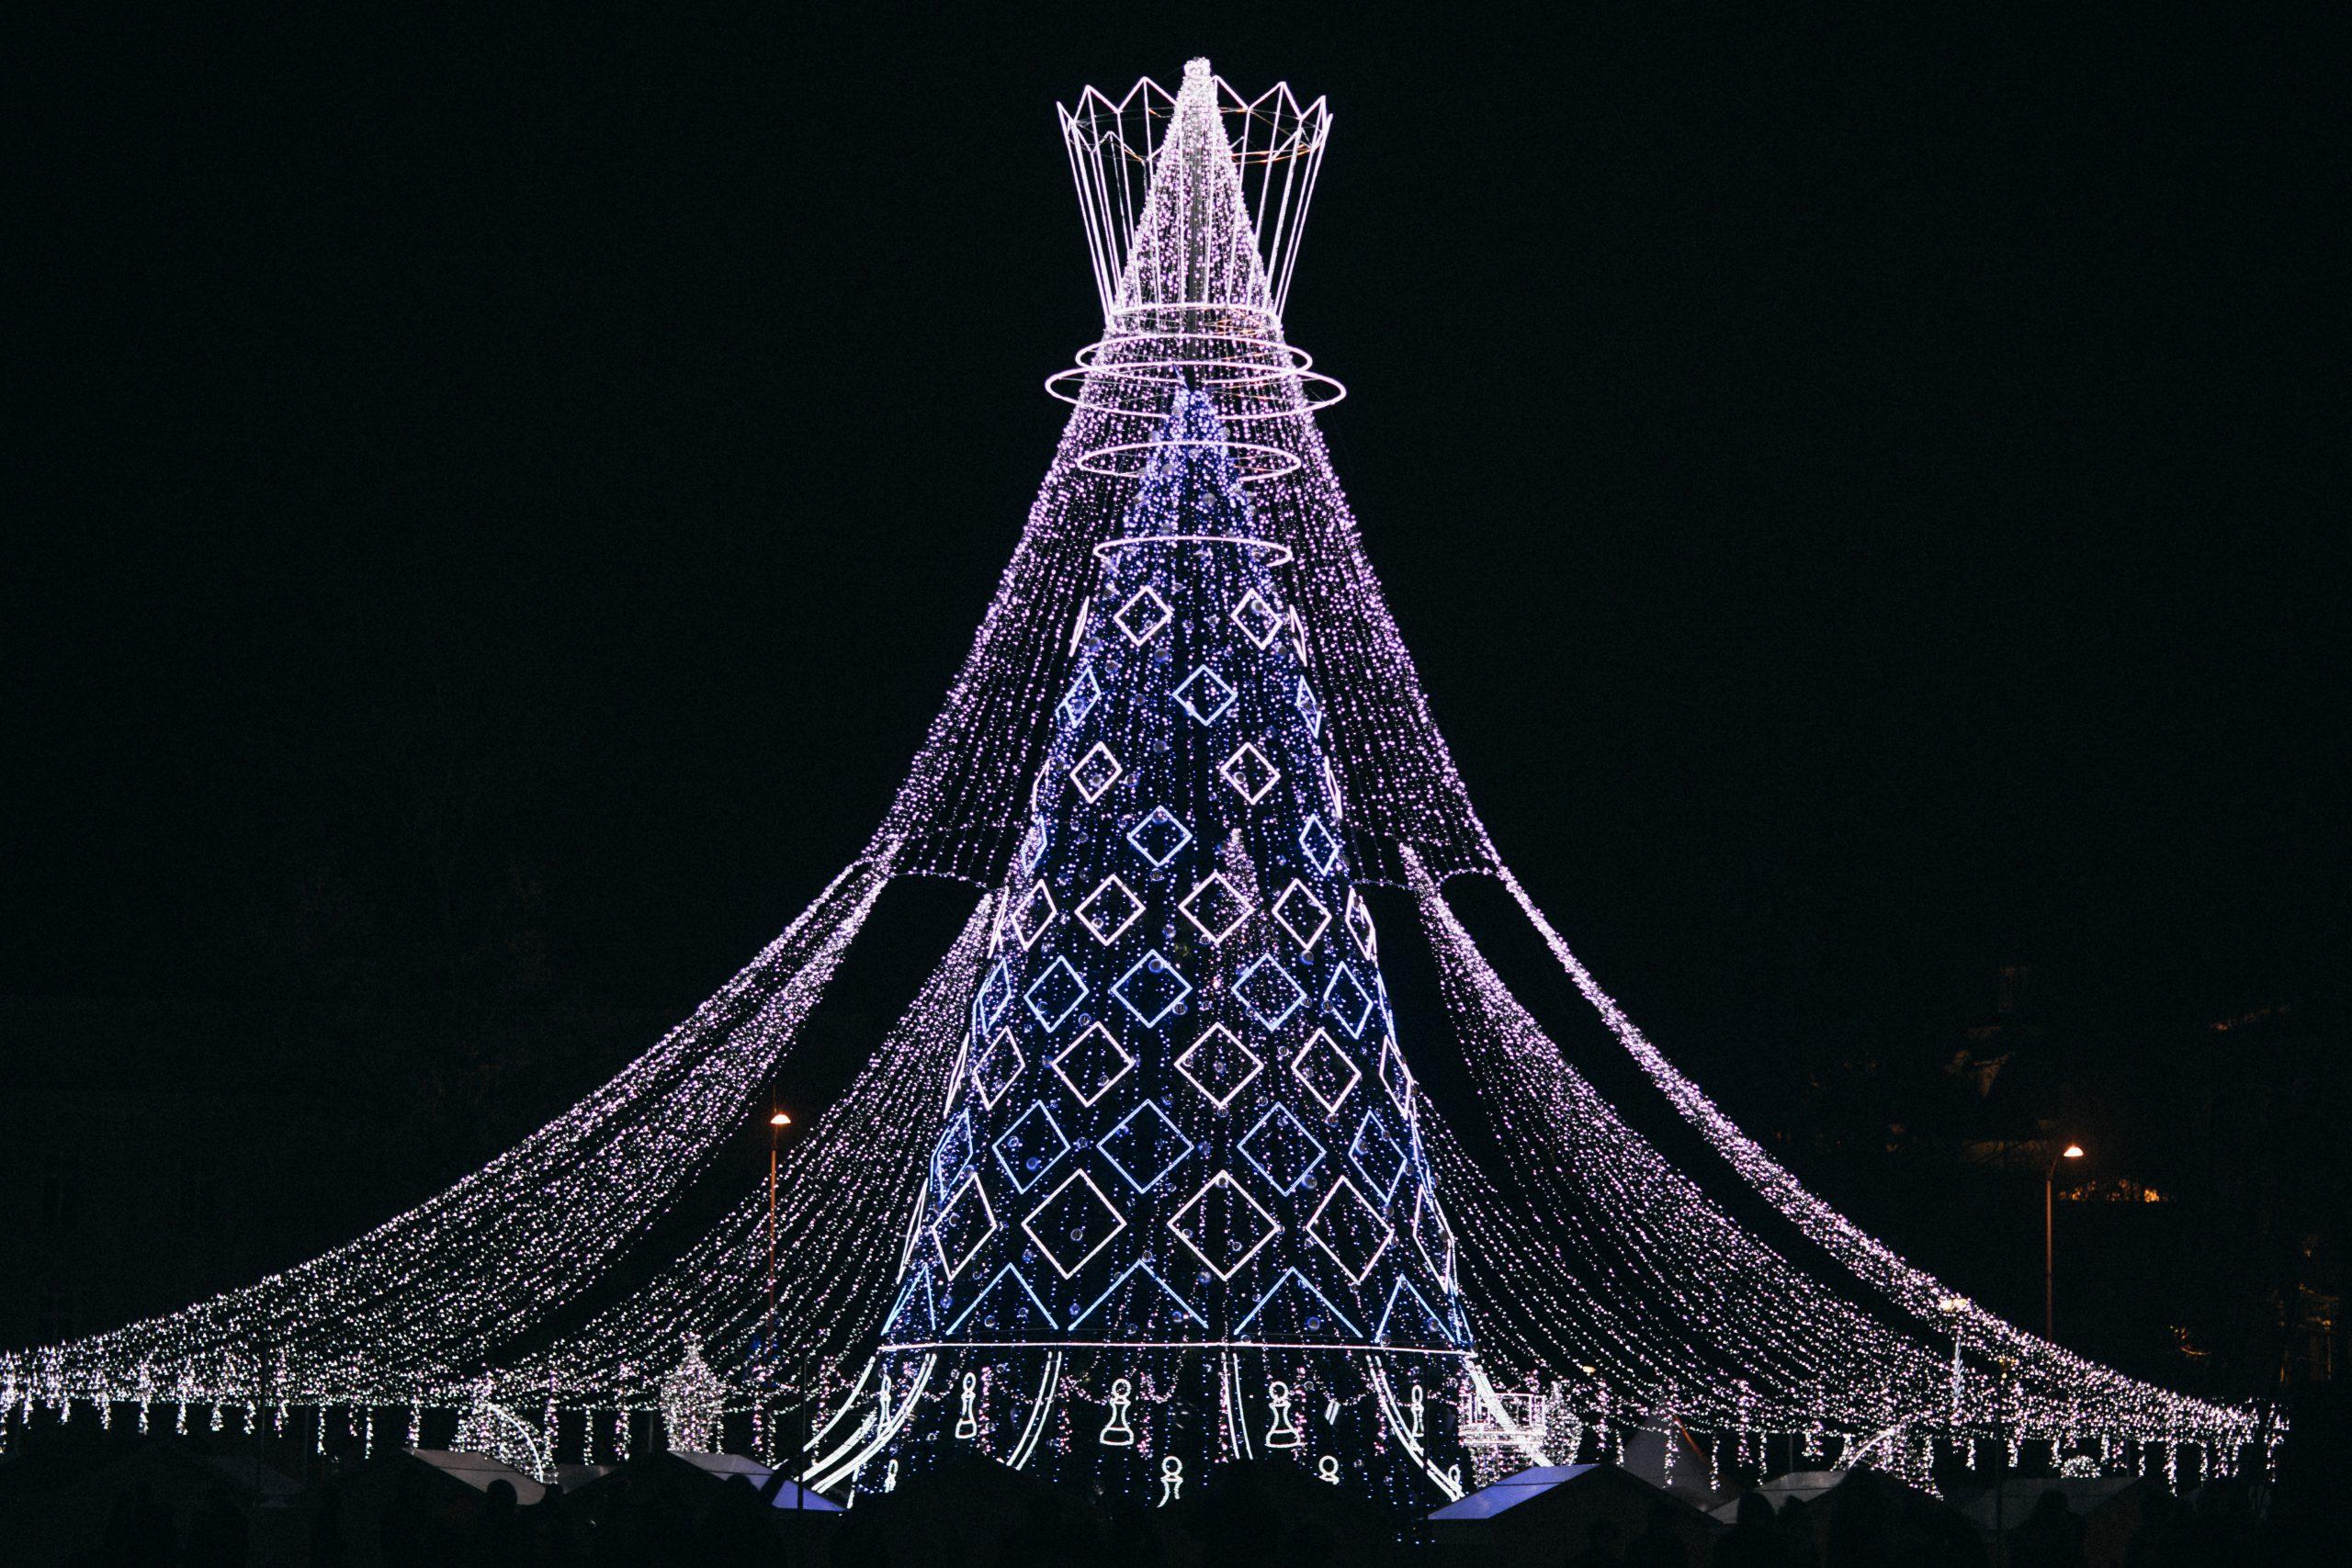 Queen Chirstmas tree in Vilnius